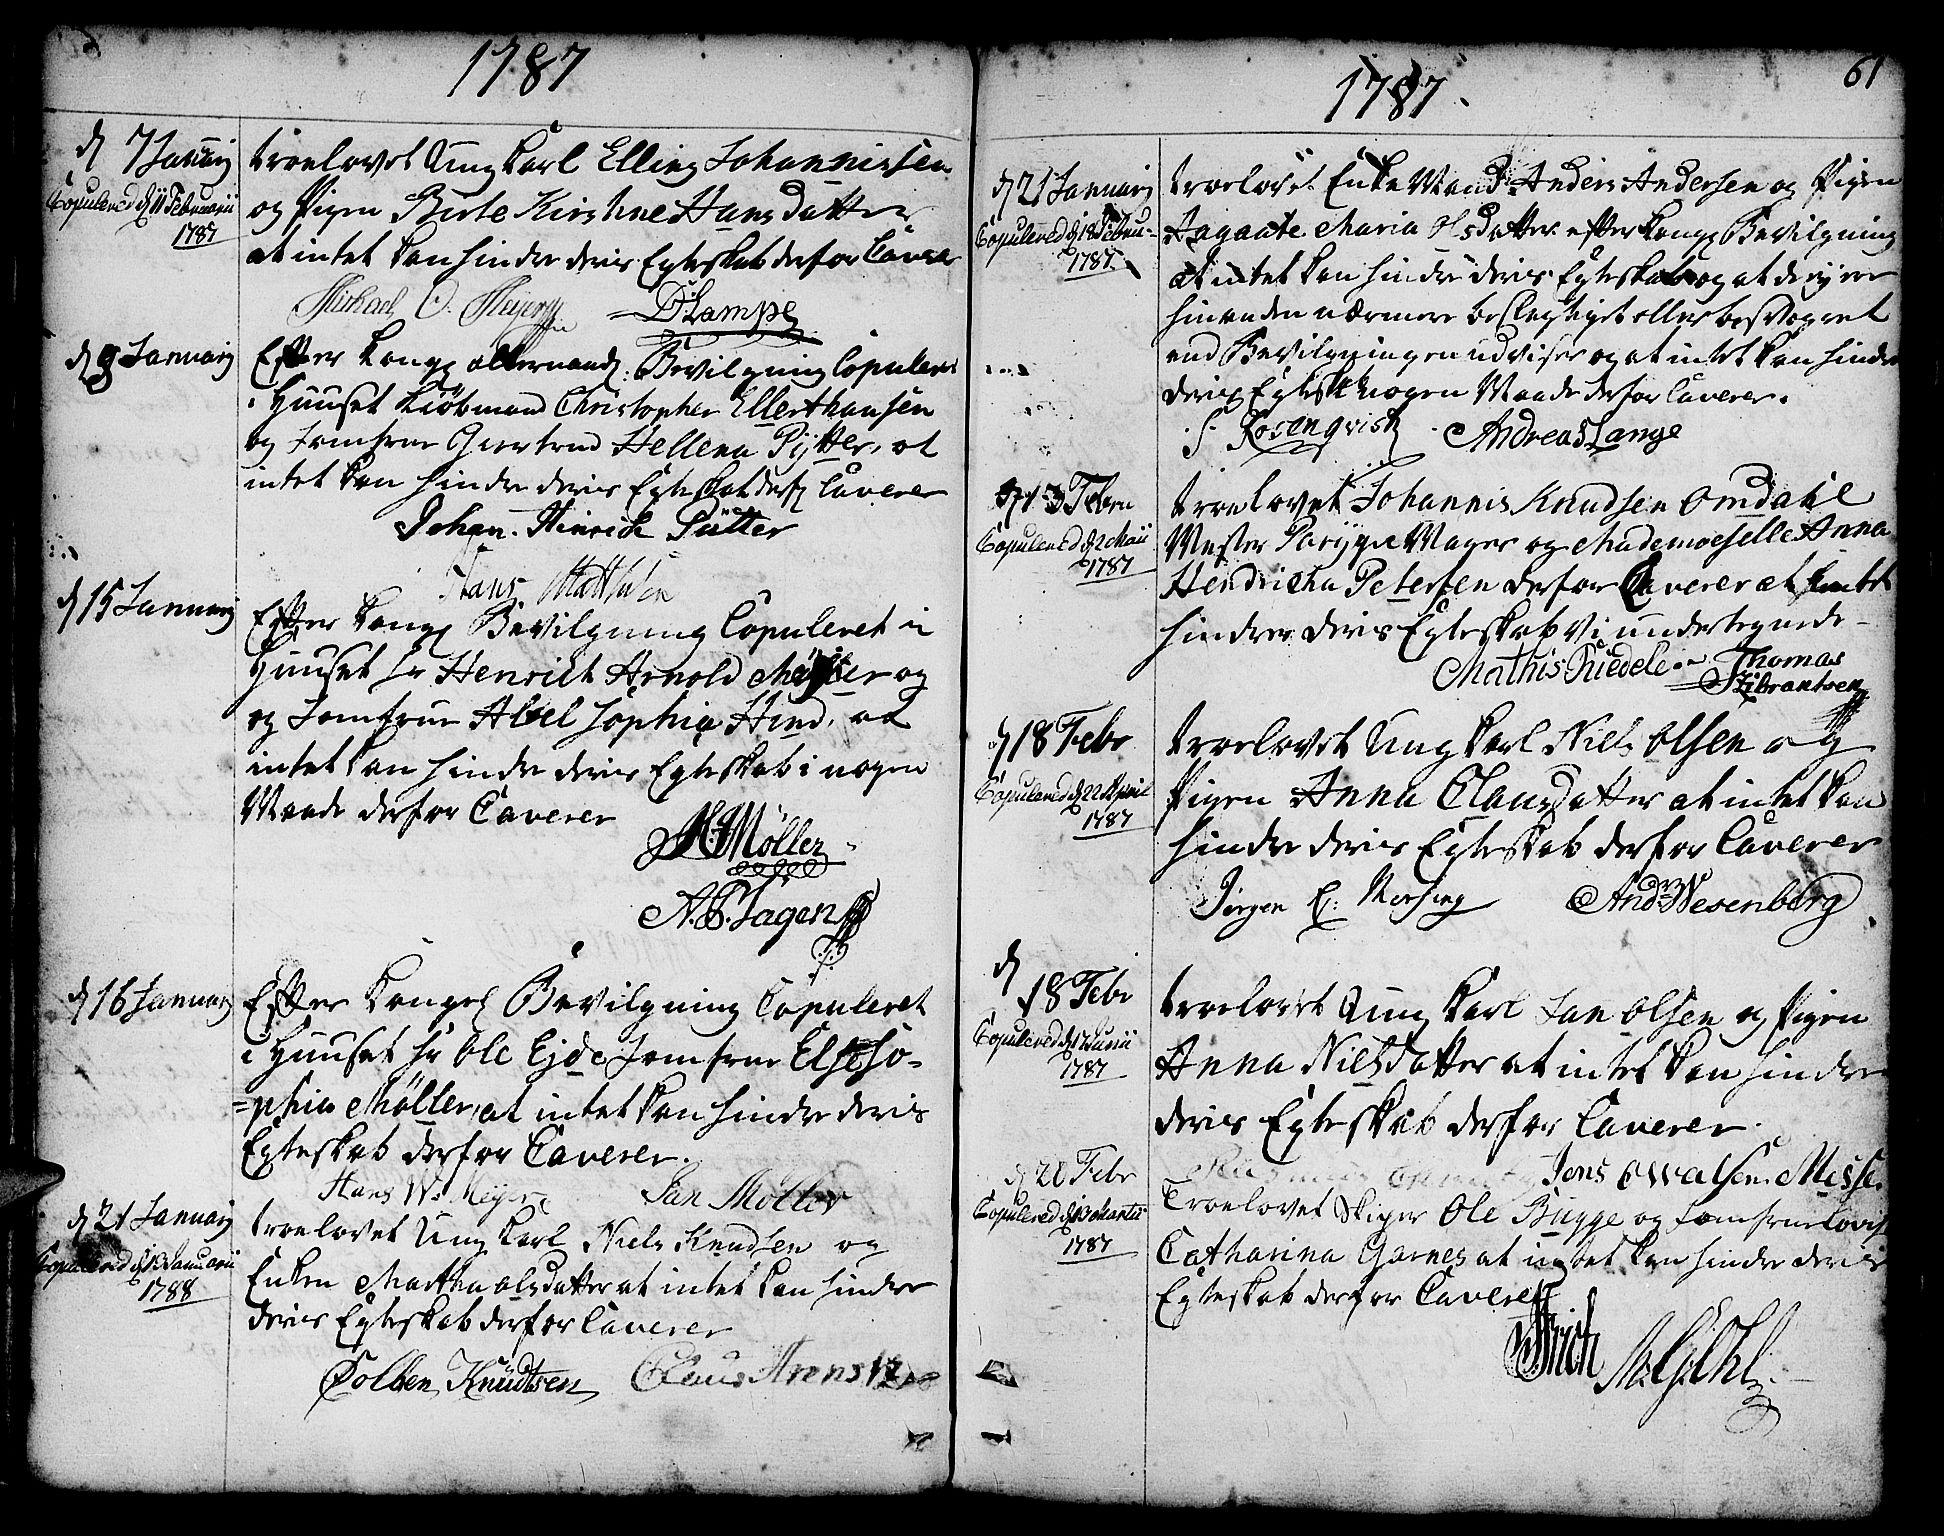 SAB, Nykirken Sokneprestembete, H/Haa: Ministerialbok nr. A 8, 1776-1814, s. 61